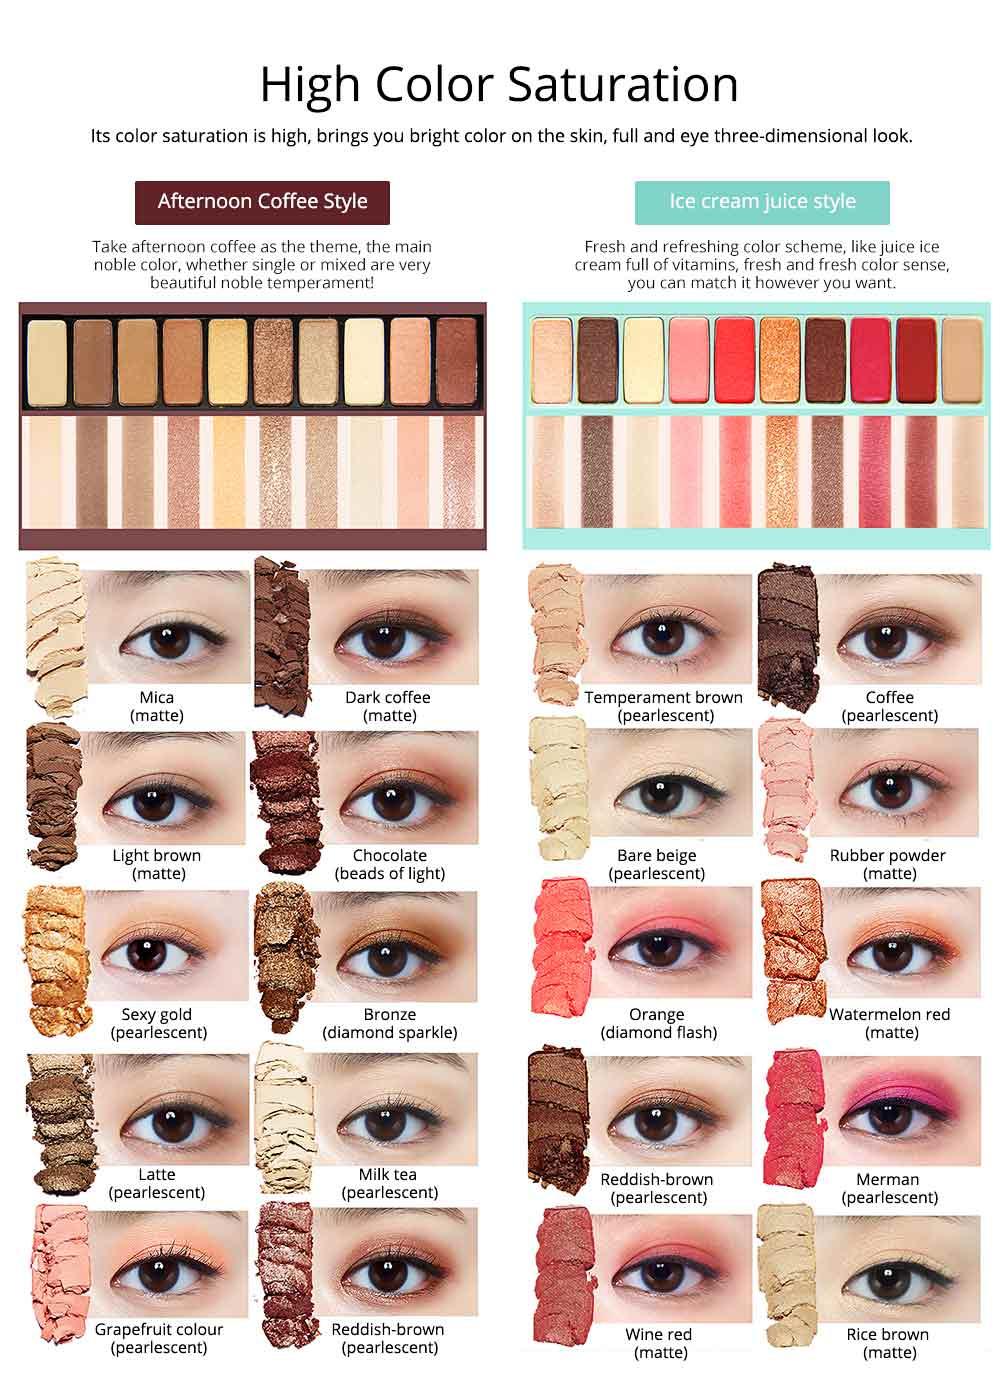 NOVO Ten Color Eye Shadow Palette, Long Lasting Eyeshadow Eye Shadow Kit, Girls Eye Makeup Beauty 2